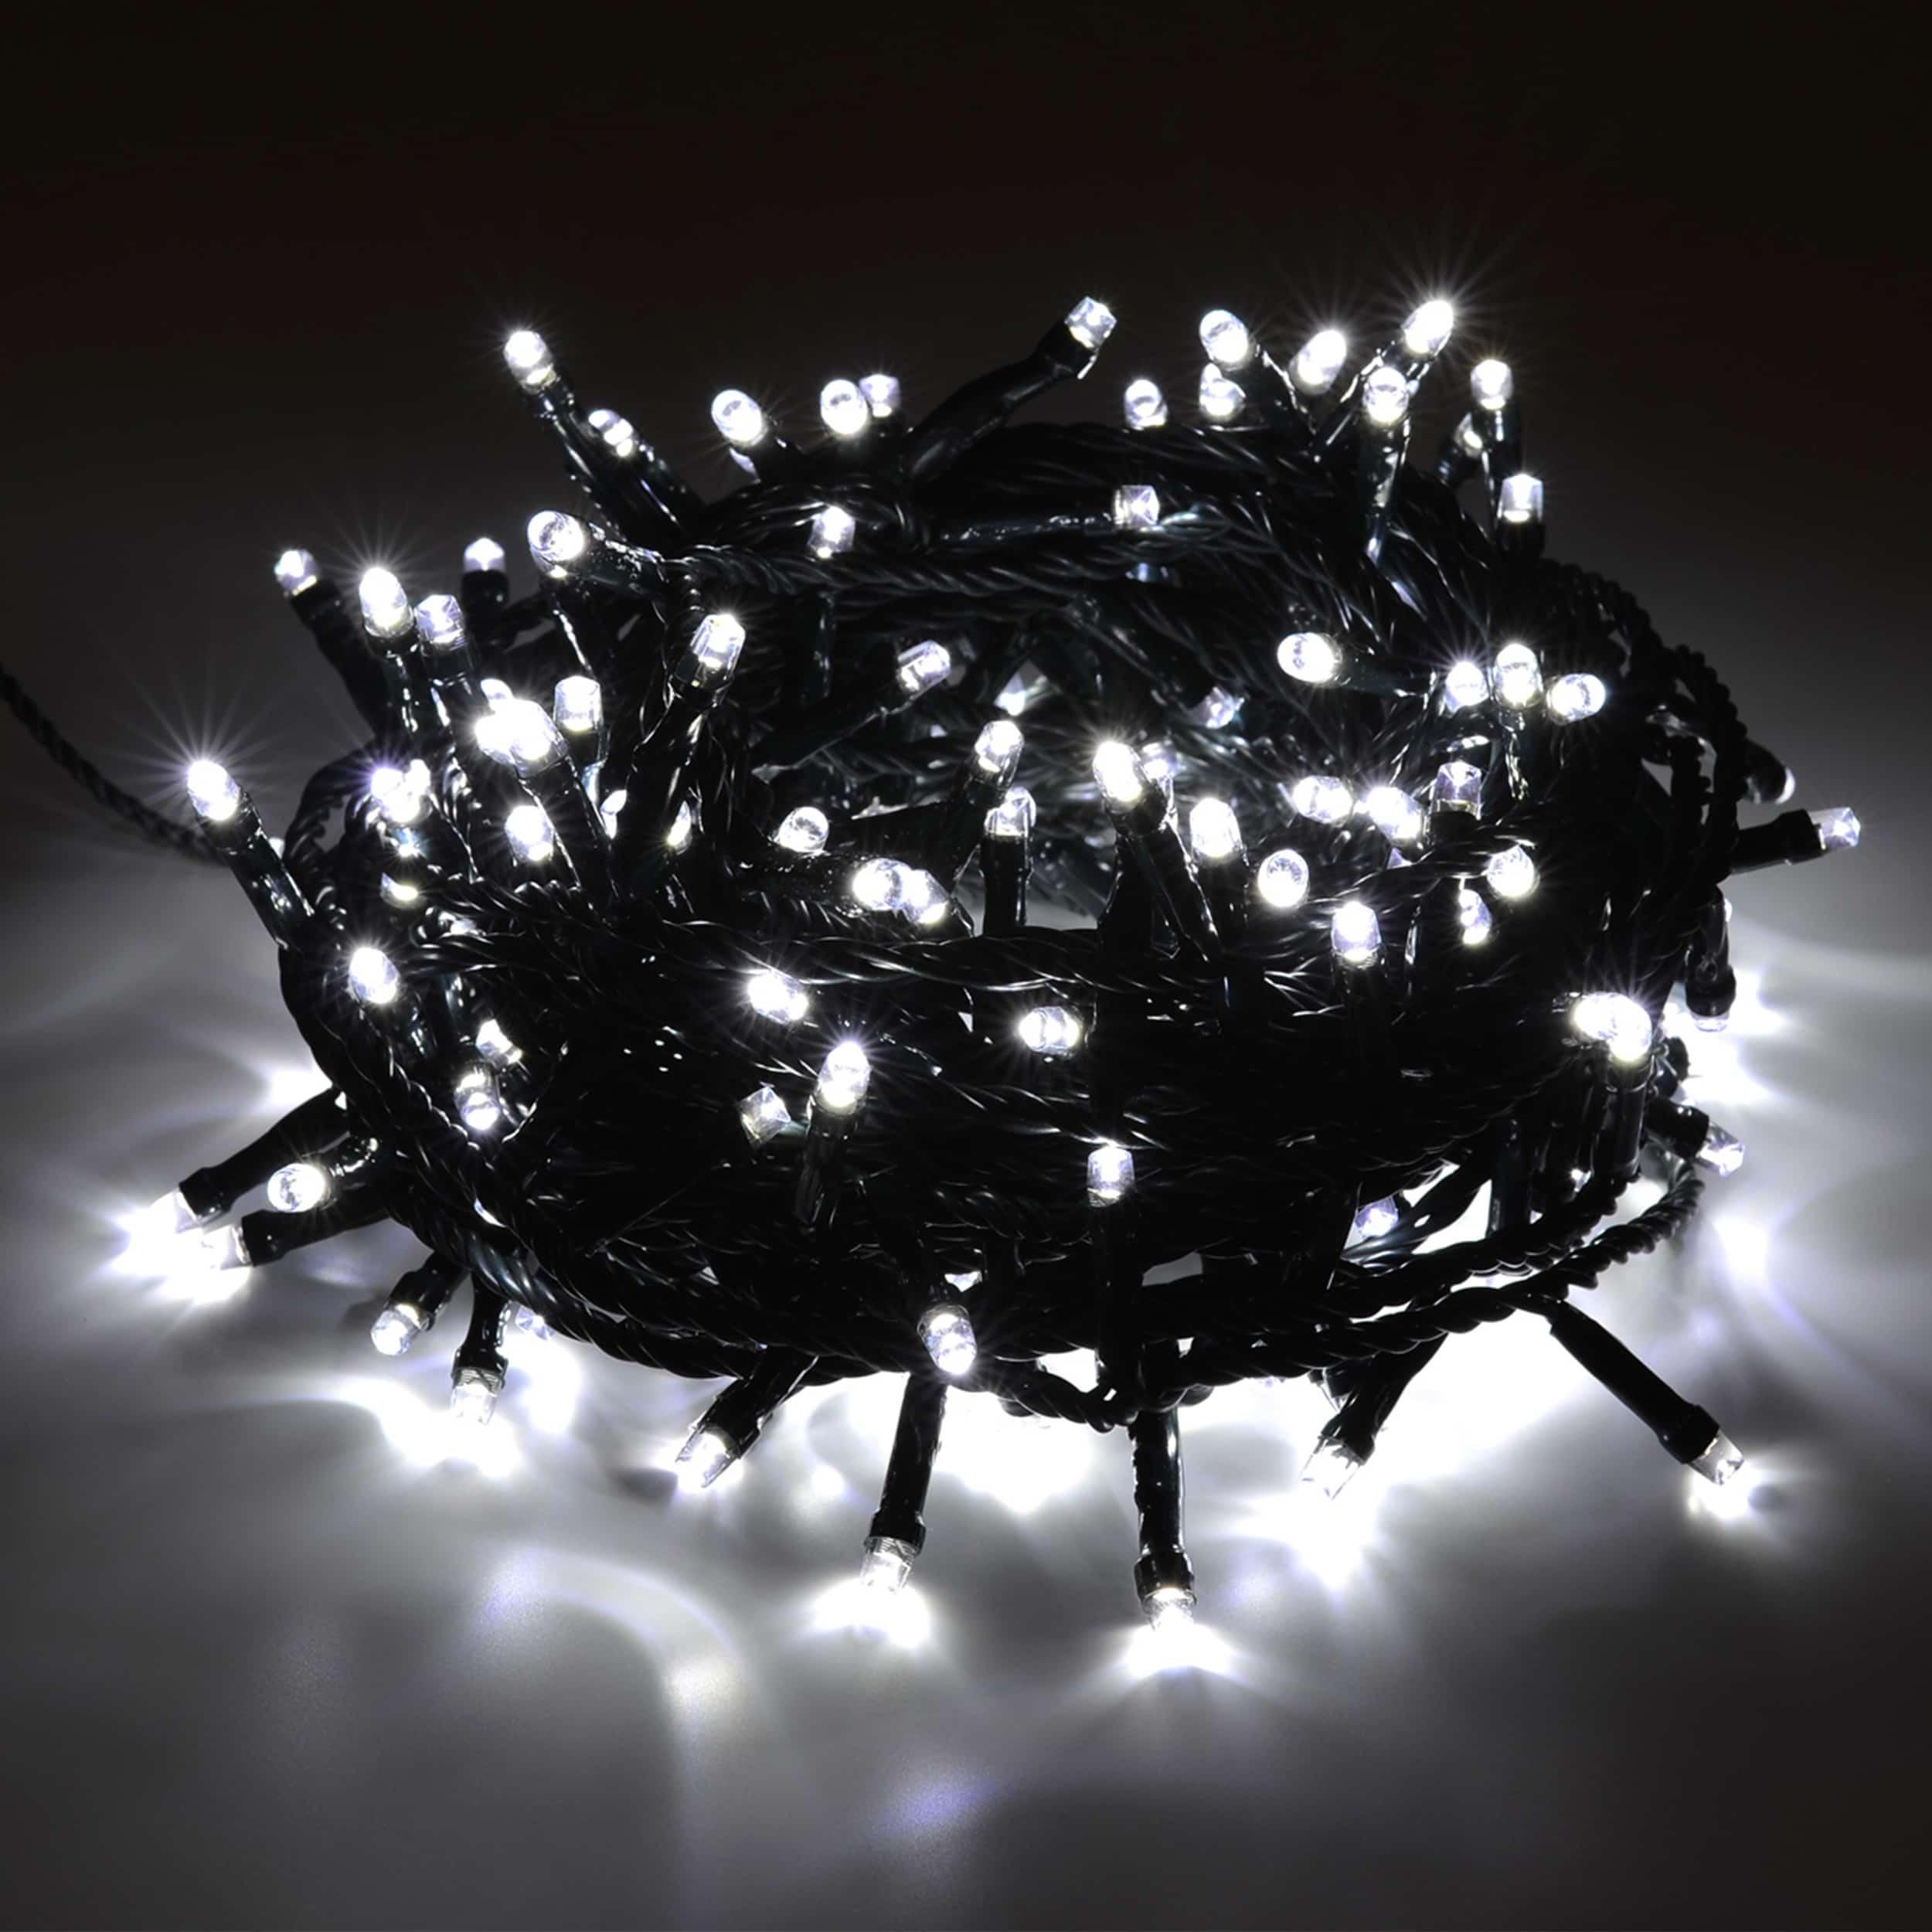 LED Lichterkette 200 LED energiesparend L10m kaltweiß